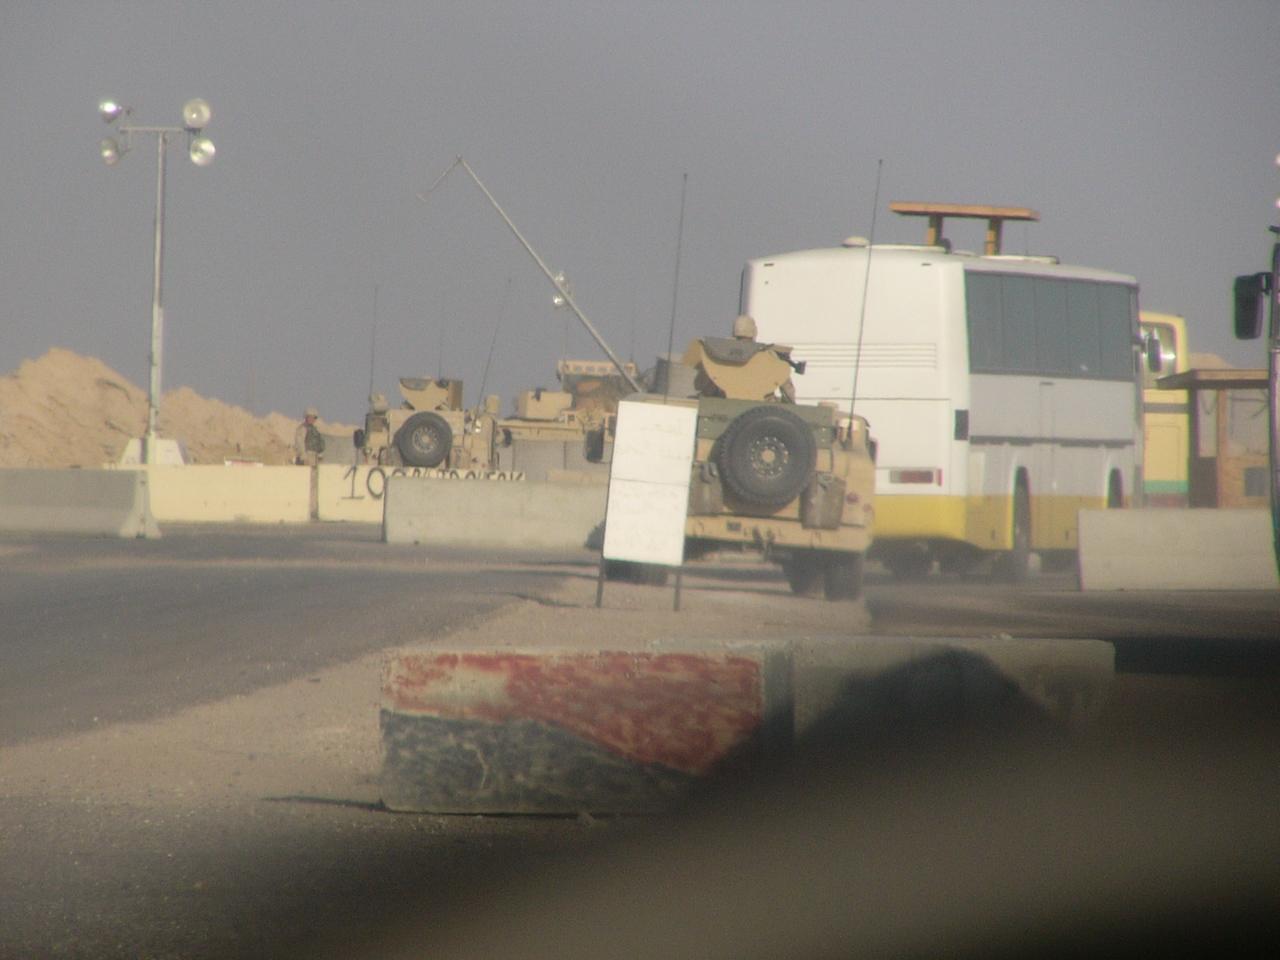 ECP Burma, Camp Bucca Iraq - Aug '04